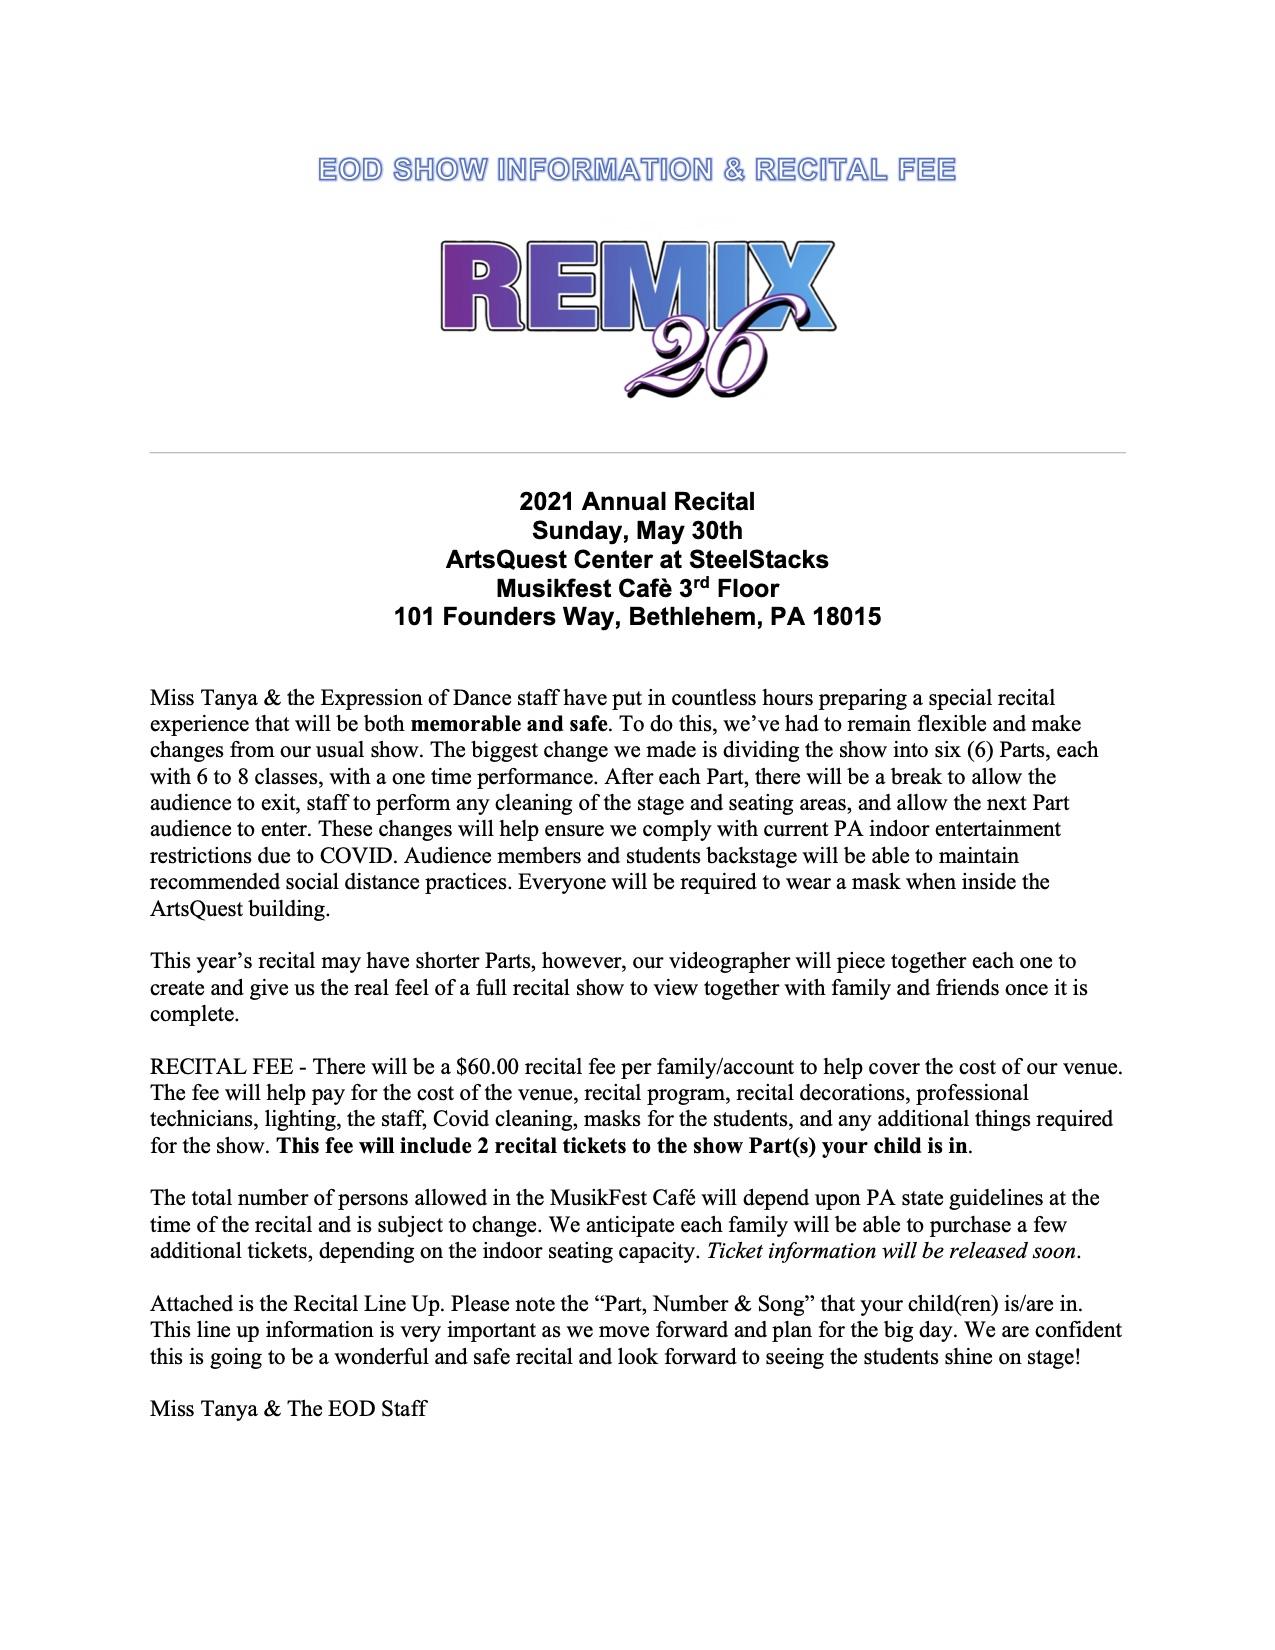 Recital Line Up Letter and Information (1)